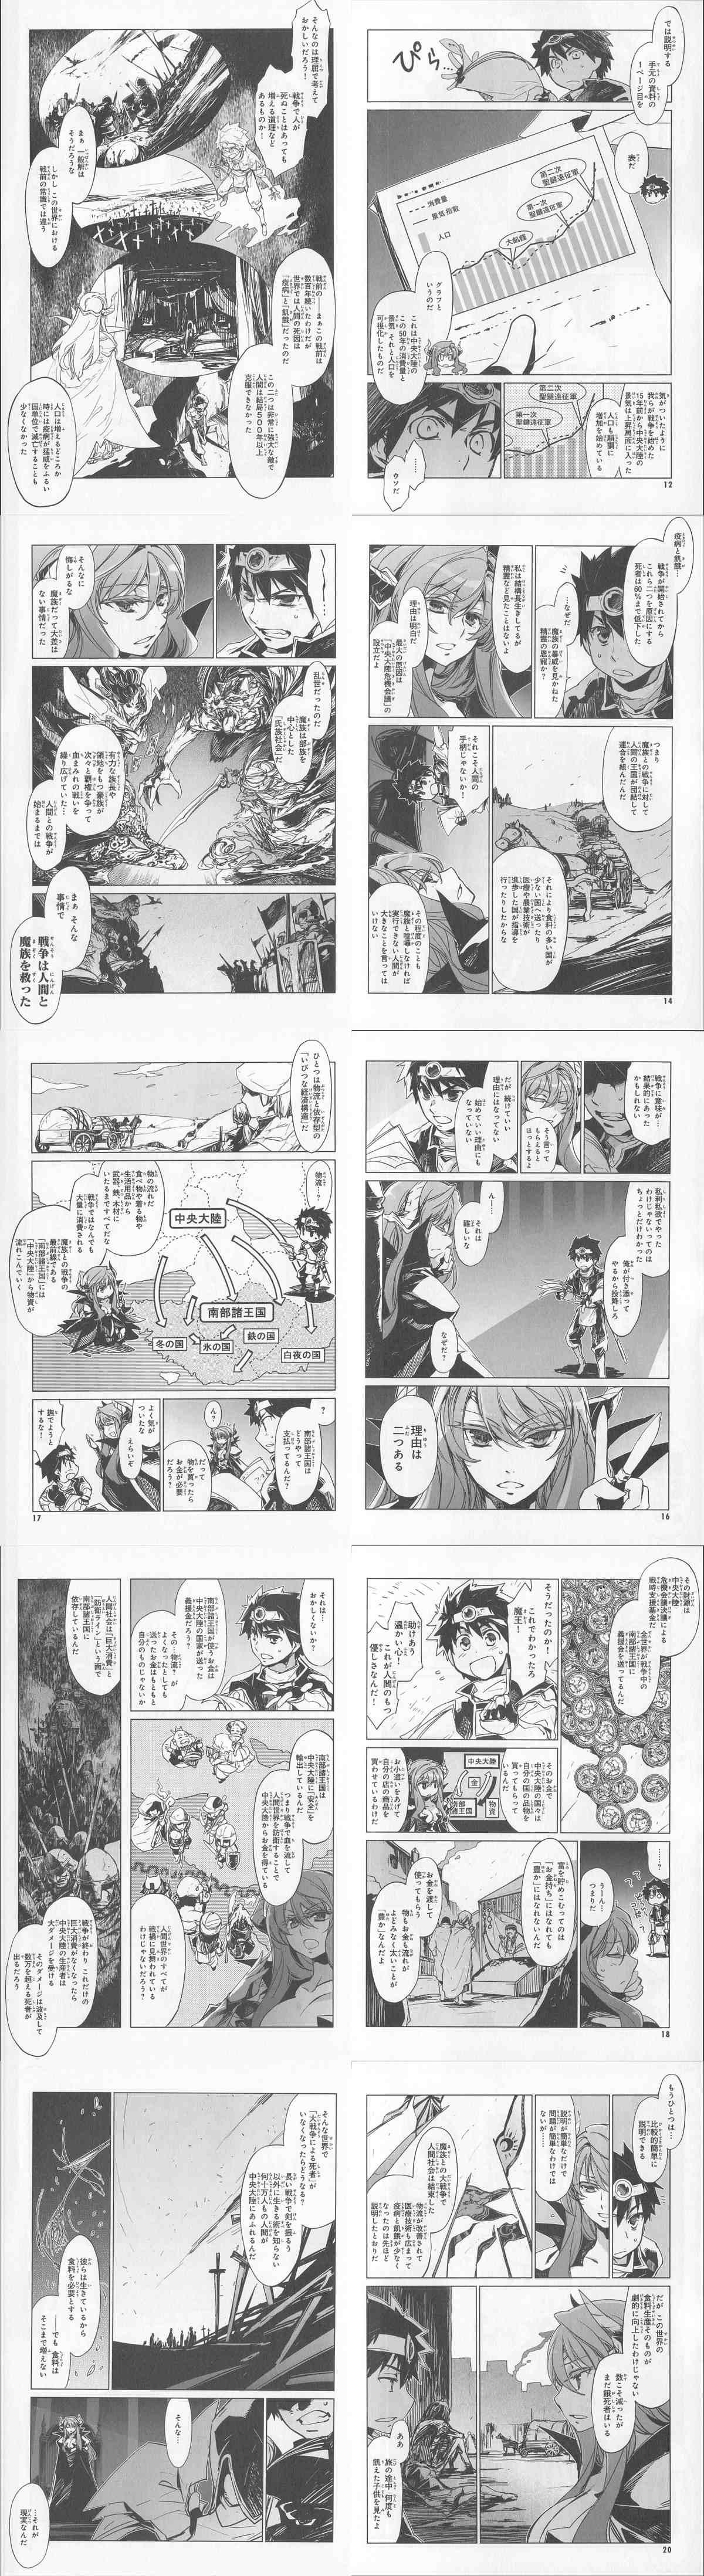 anime20ch213217.jpg